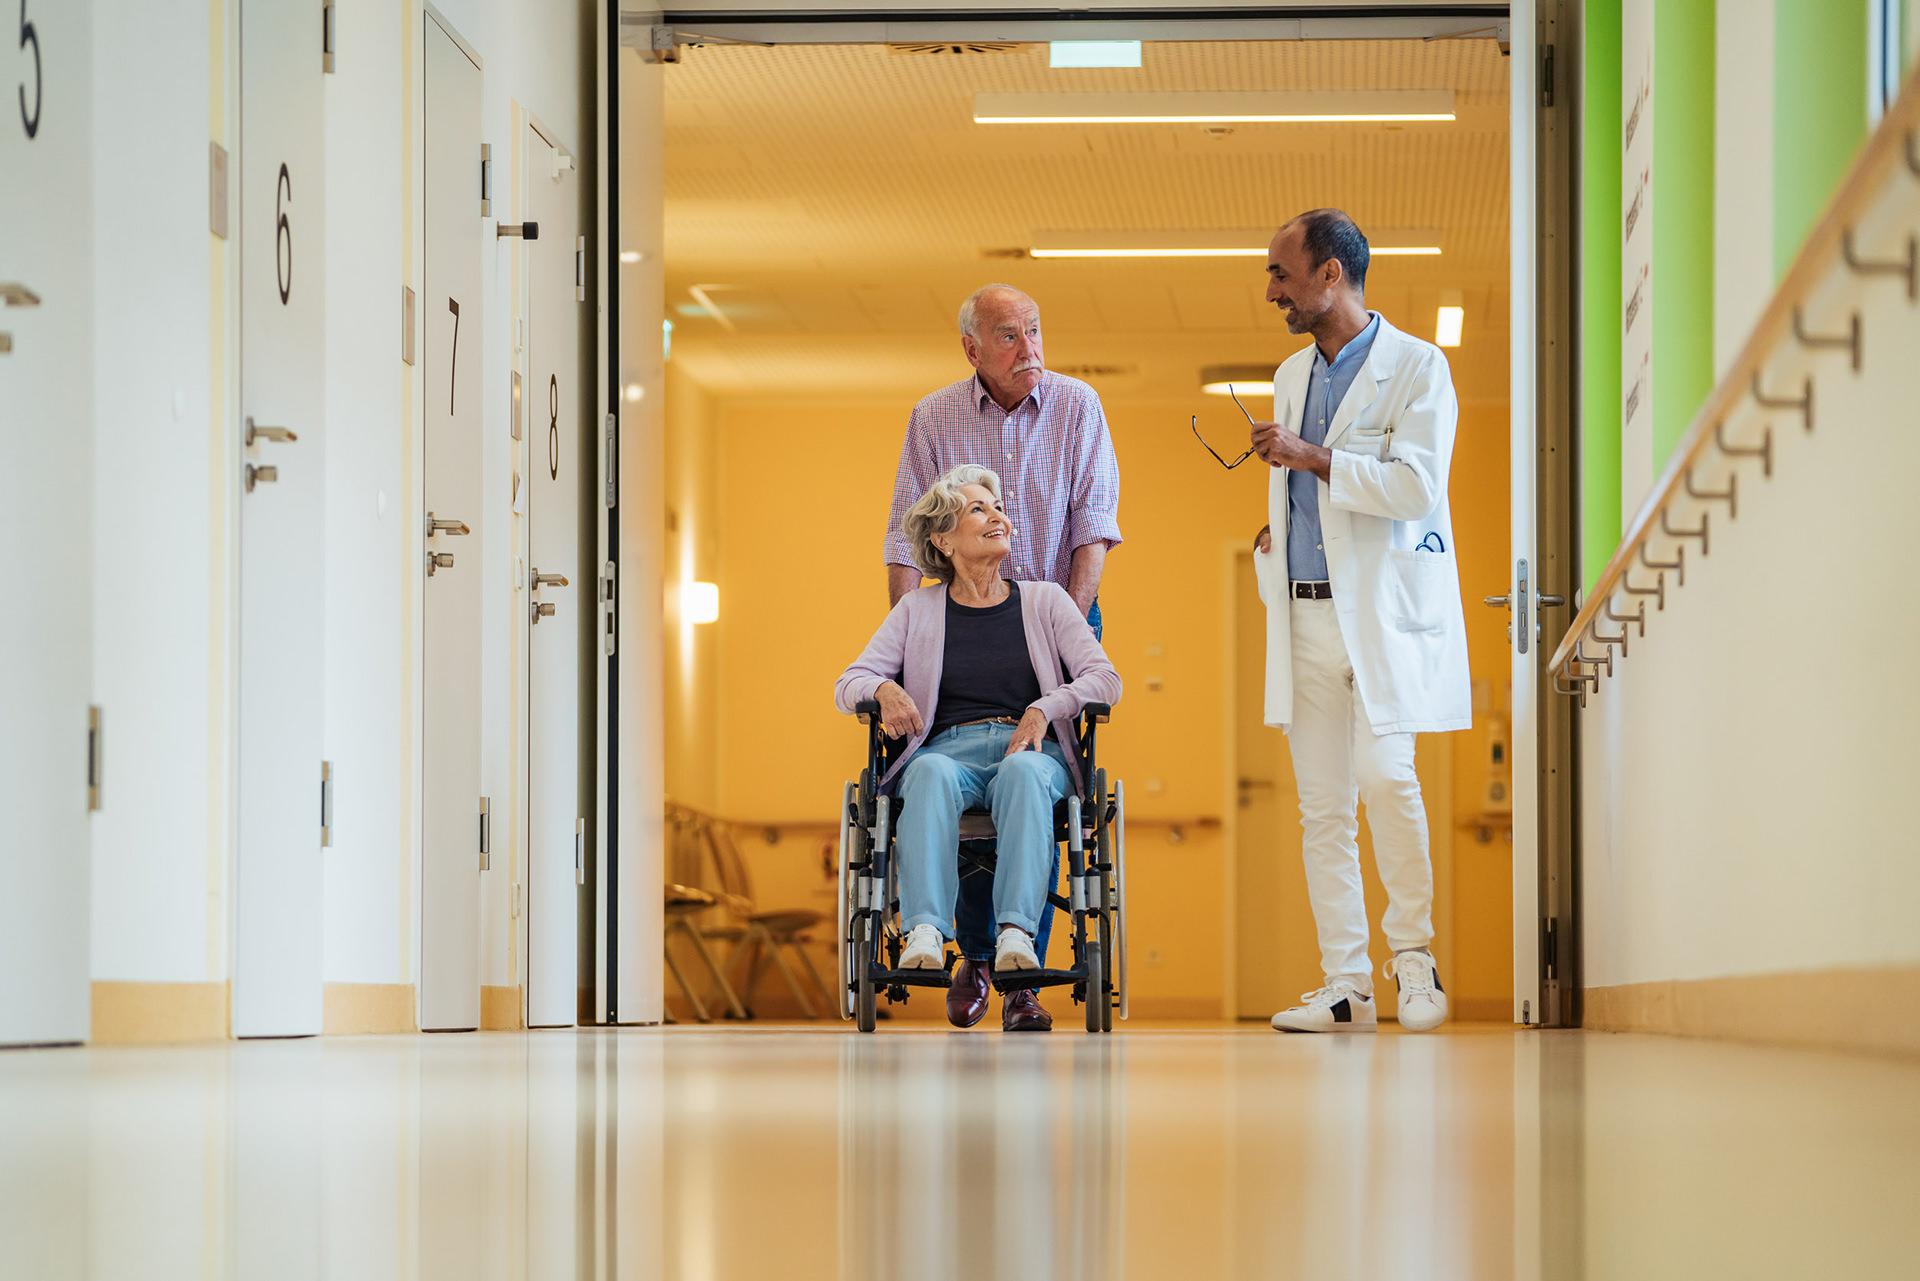 krankenhaus-flur-medizin-pflege-arzt